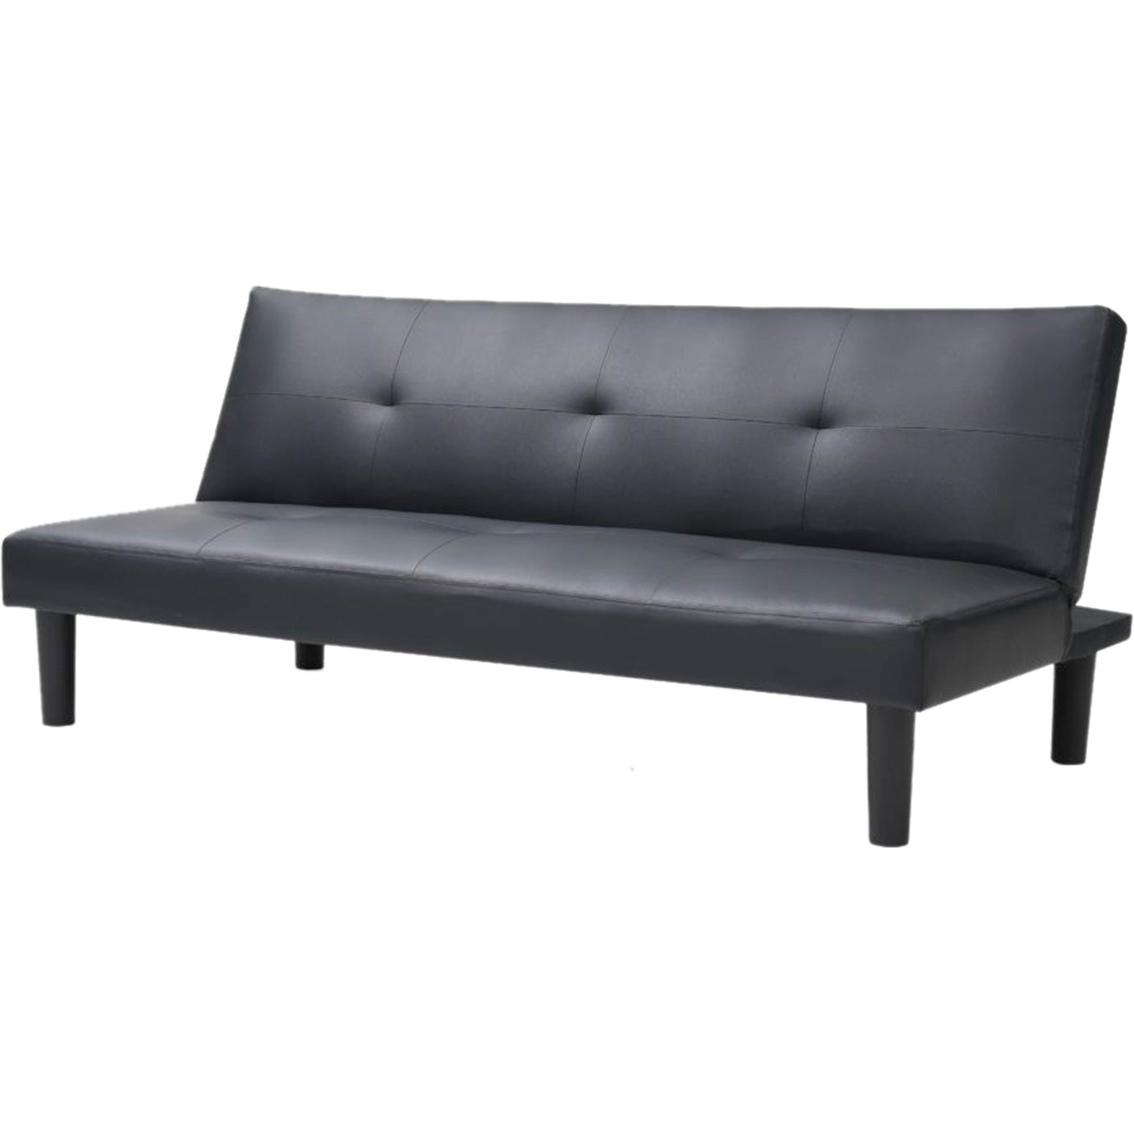 Hodedah Click Clack Sofa Bed Sofas Couches Home Appliances